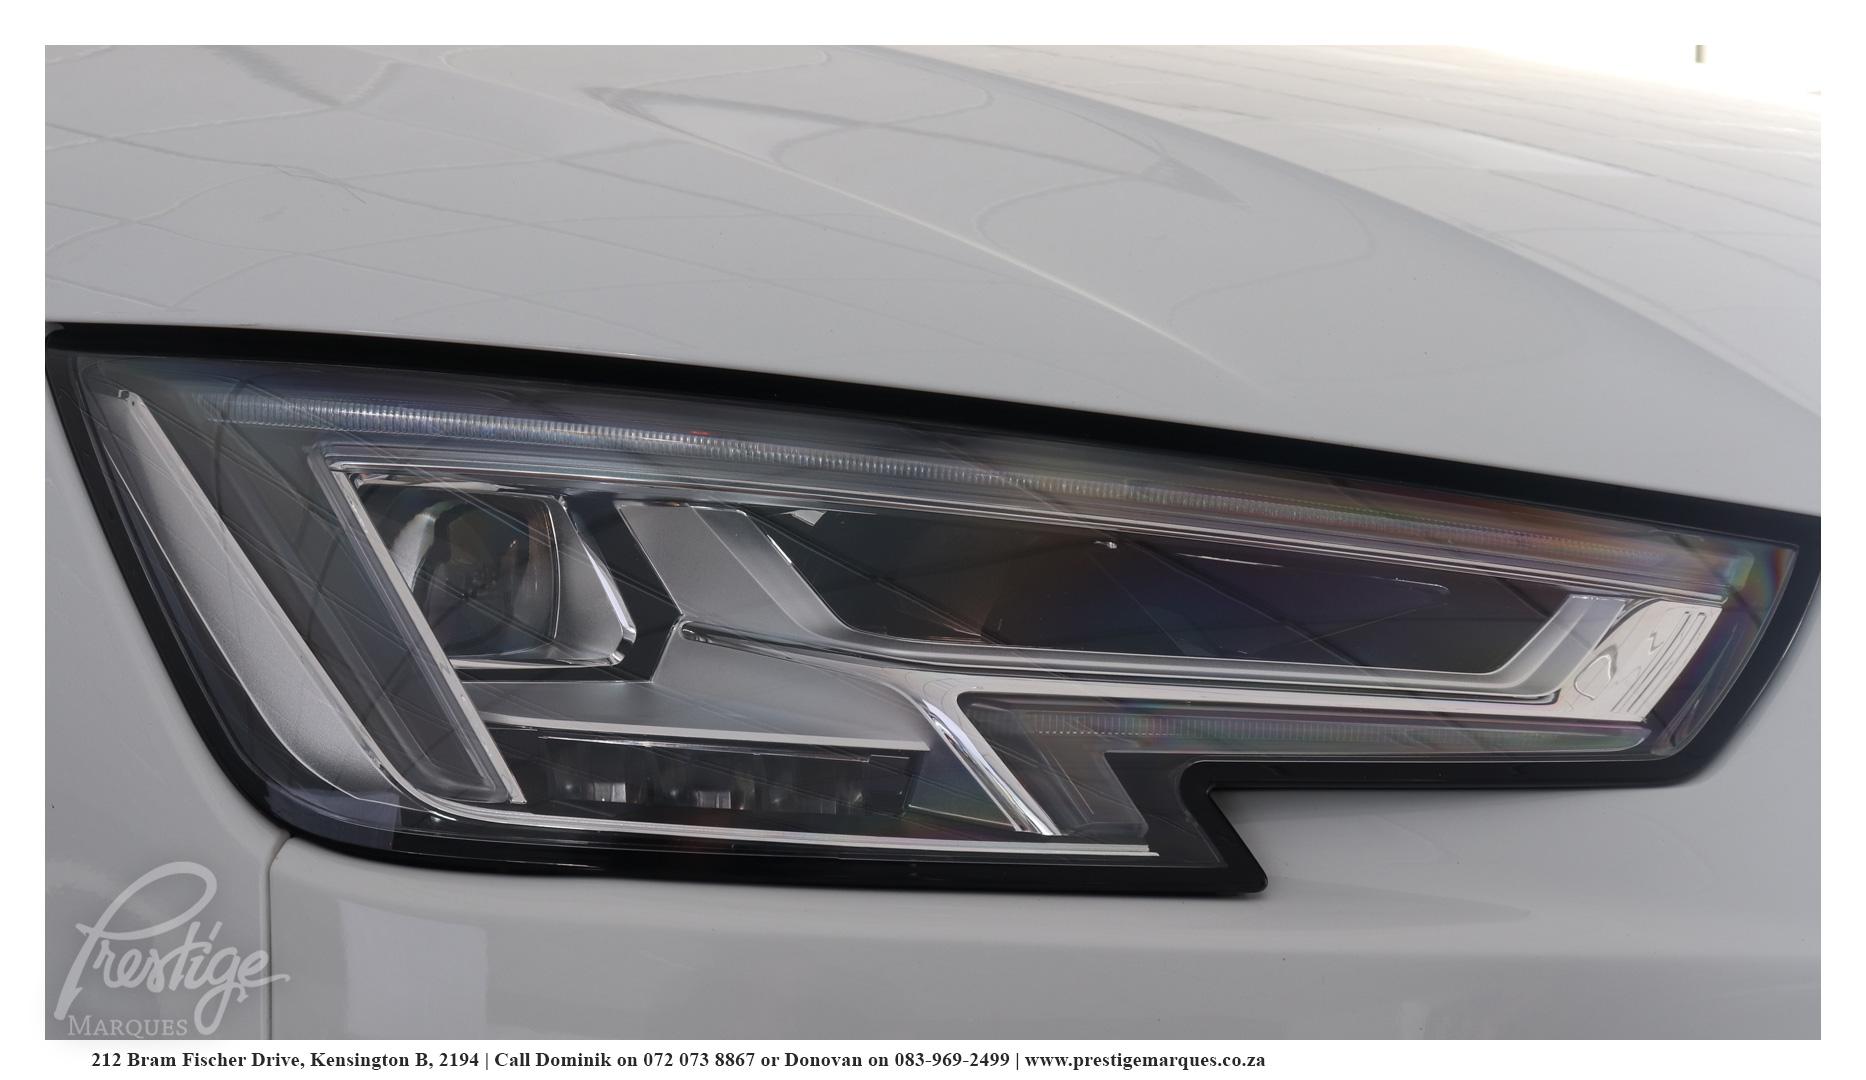 2018-Audi-A4-20-TFSI-STRONIC-Prestige-Marques-9